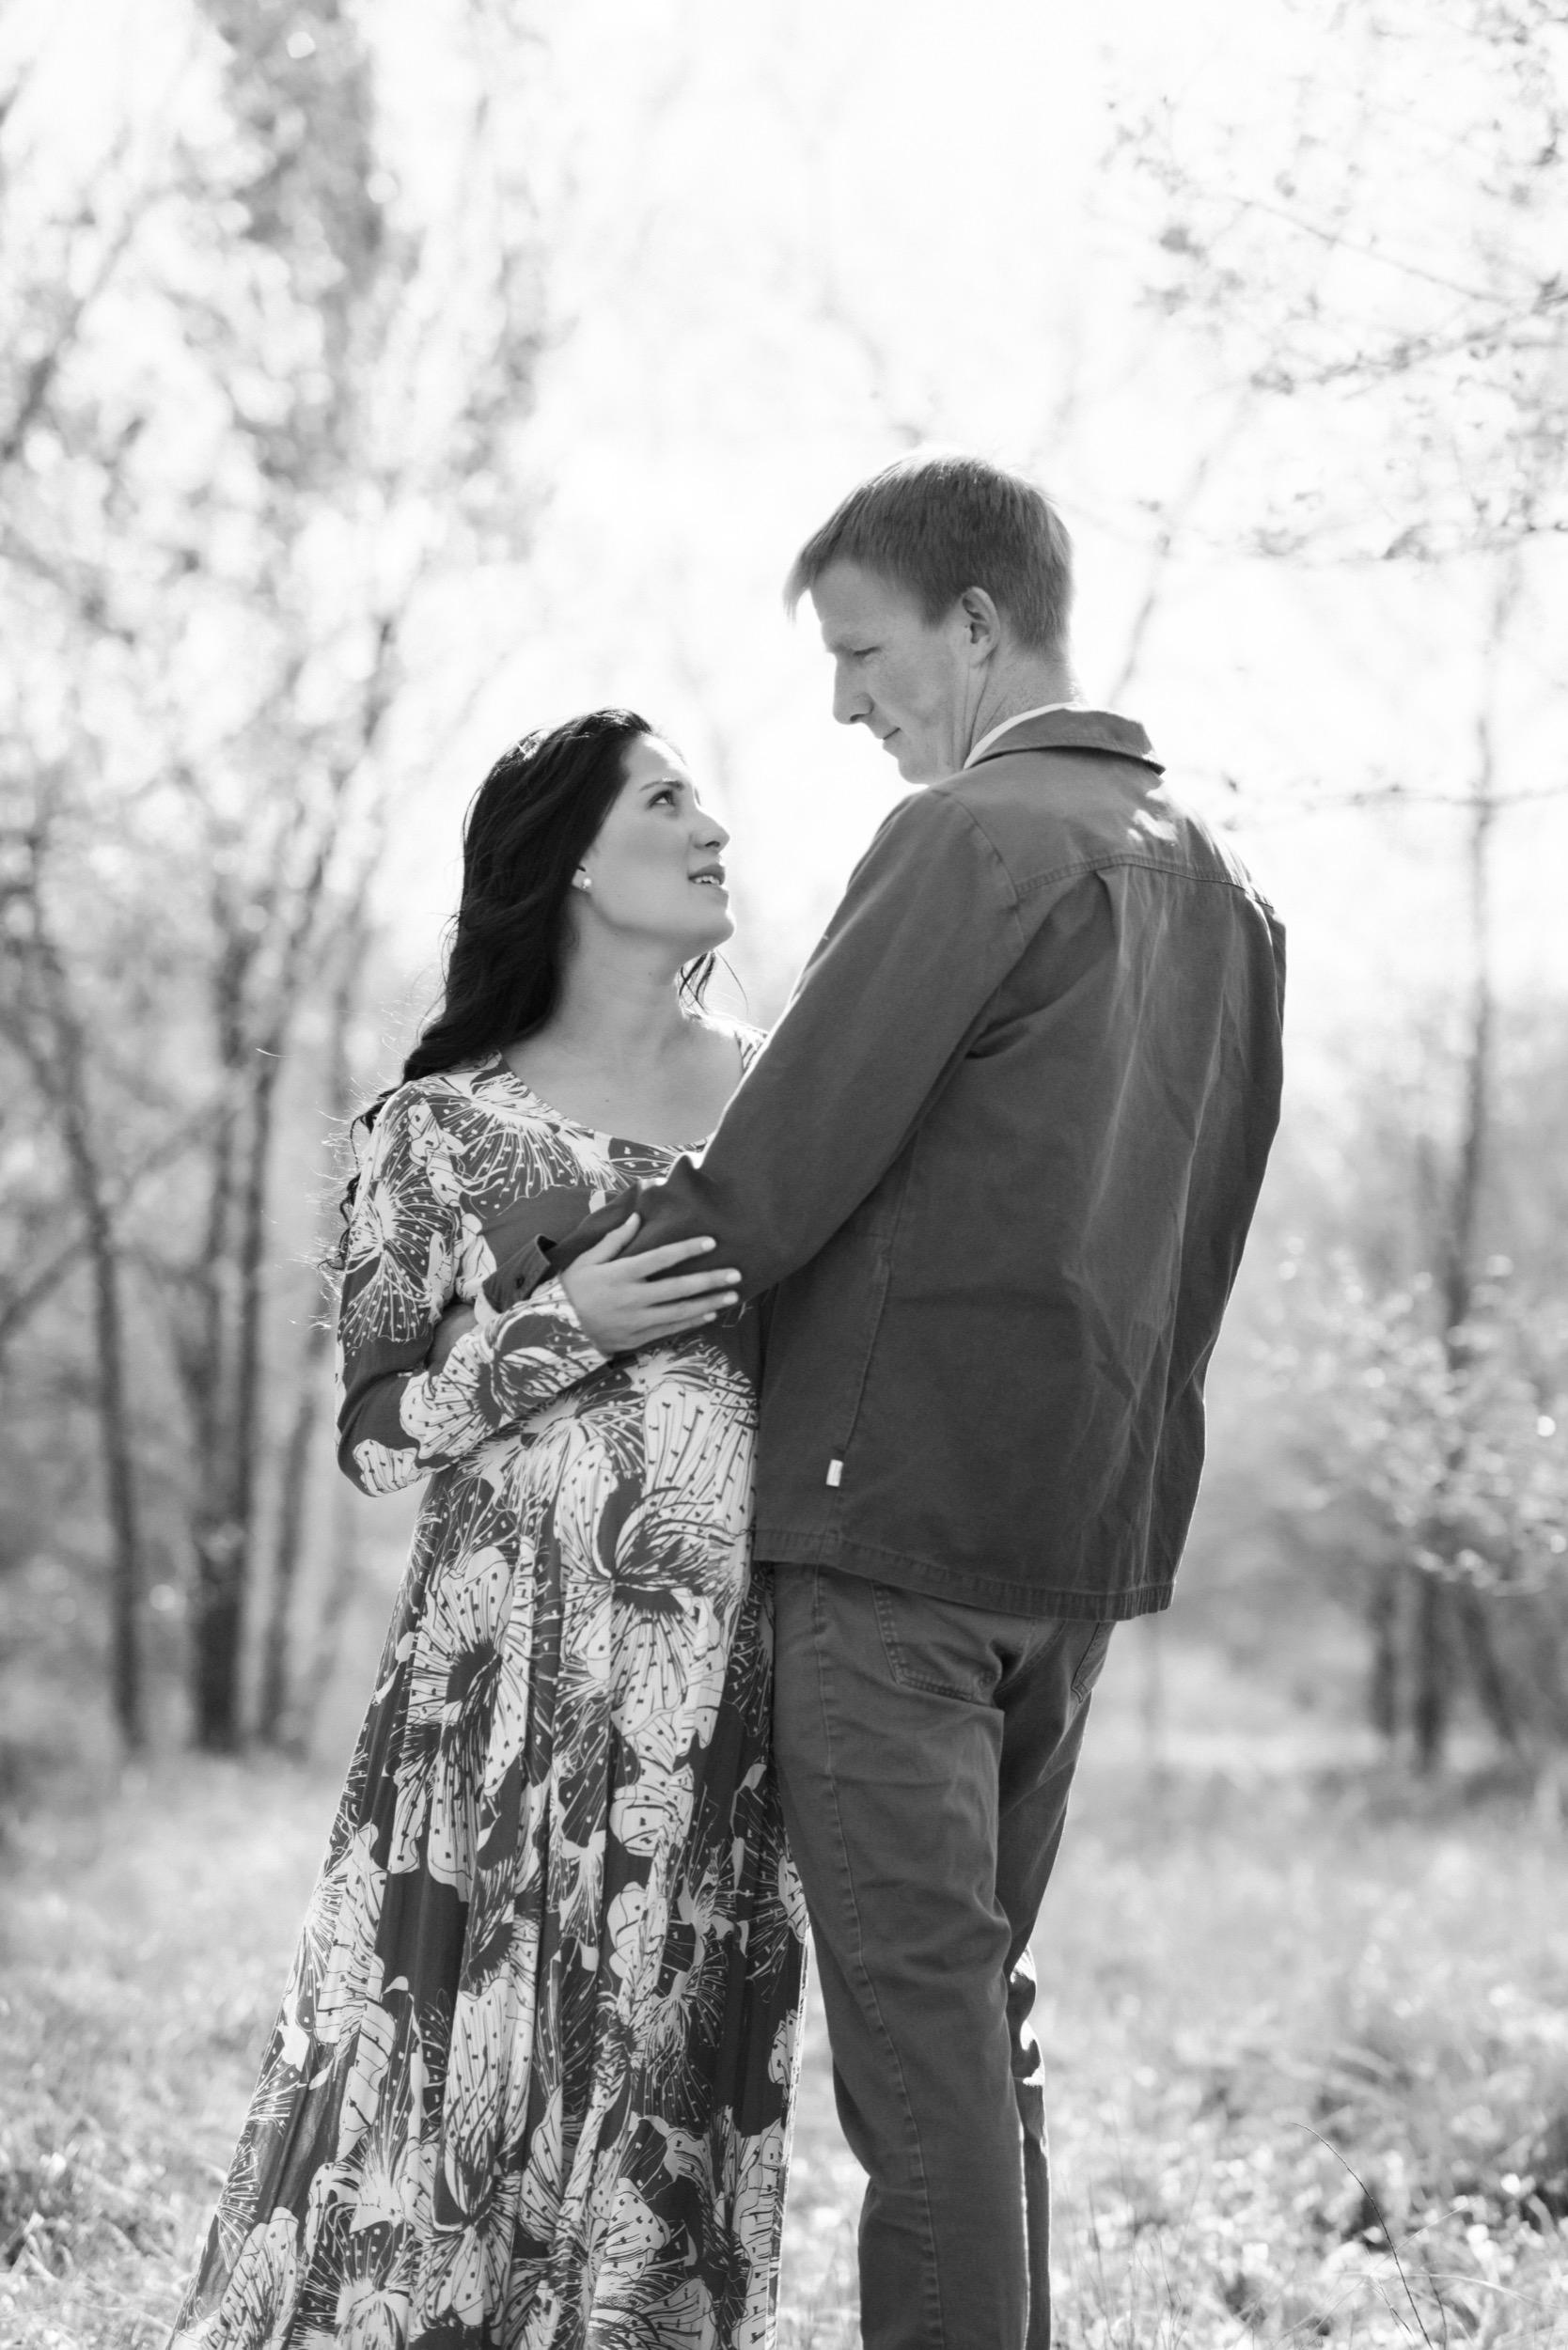 Carissa and Ben-maternity-southwest photographer-destination photographer-new mexico wedding-1014.jpg